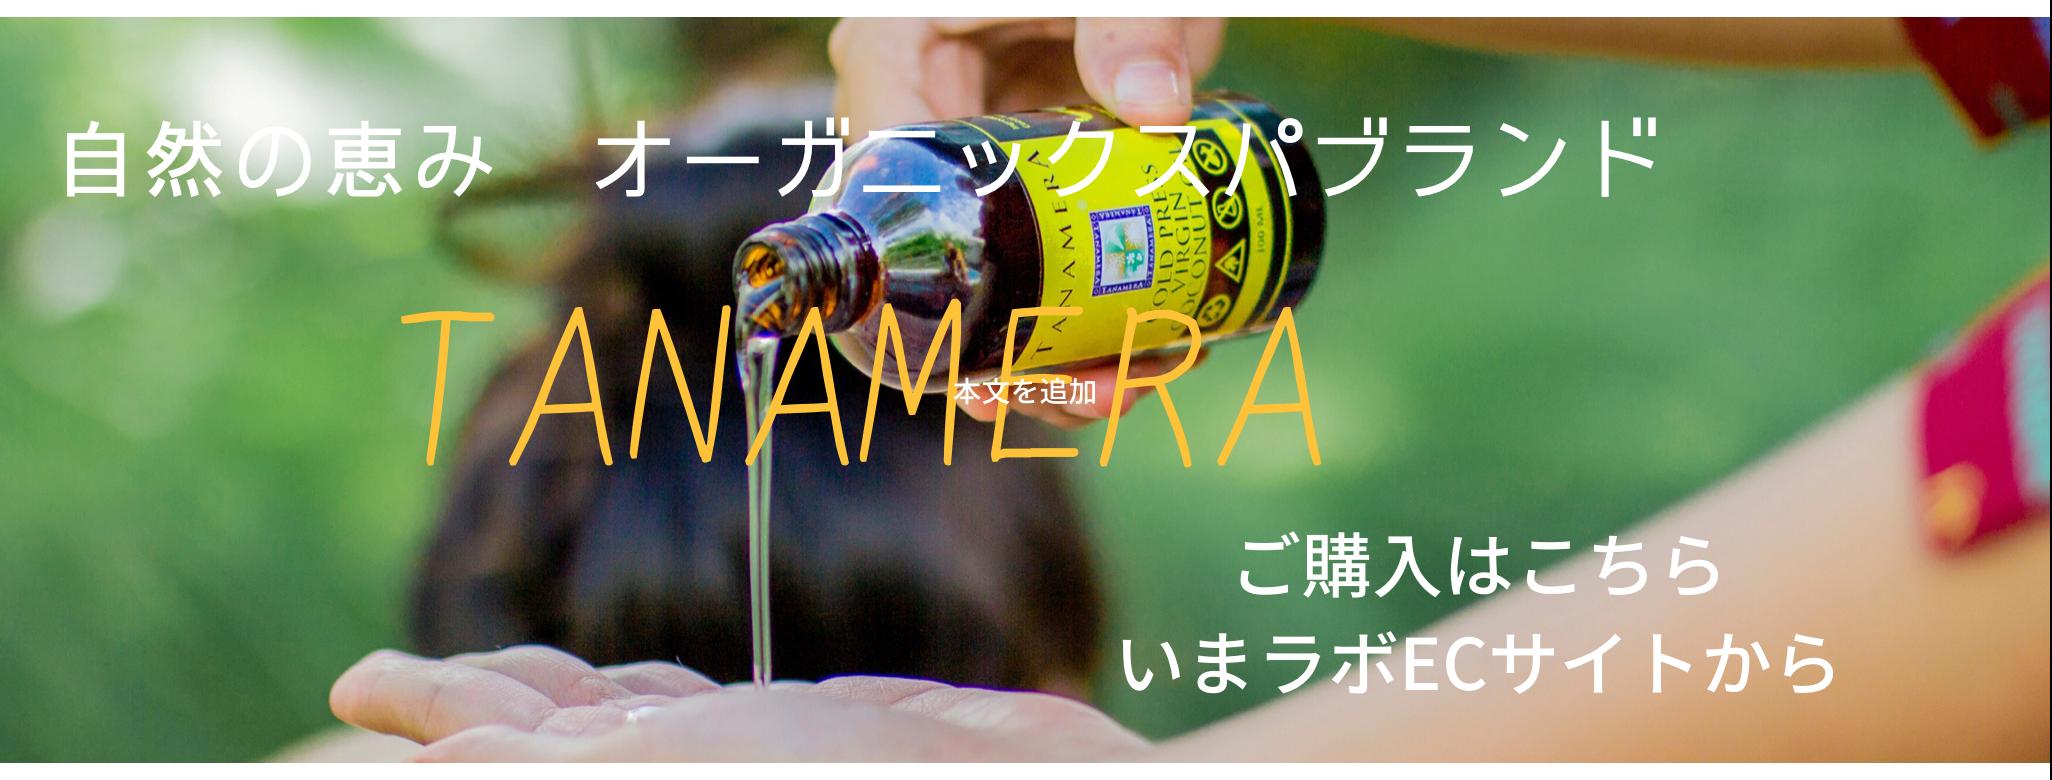 tanamera ec site